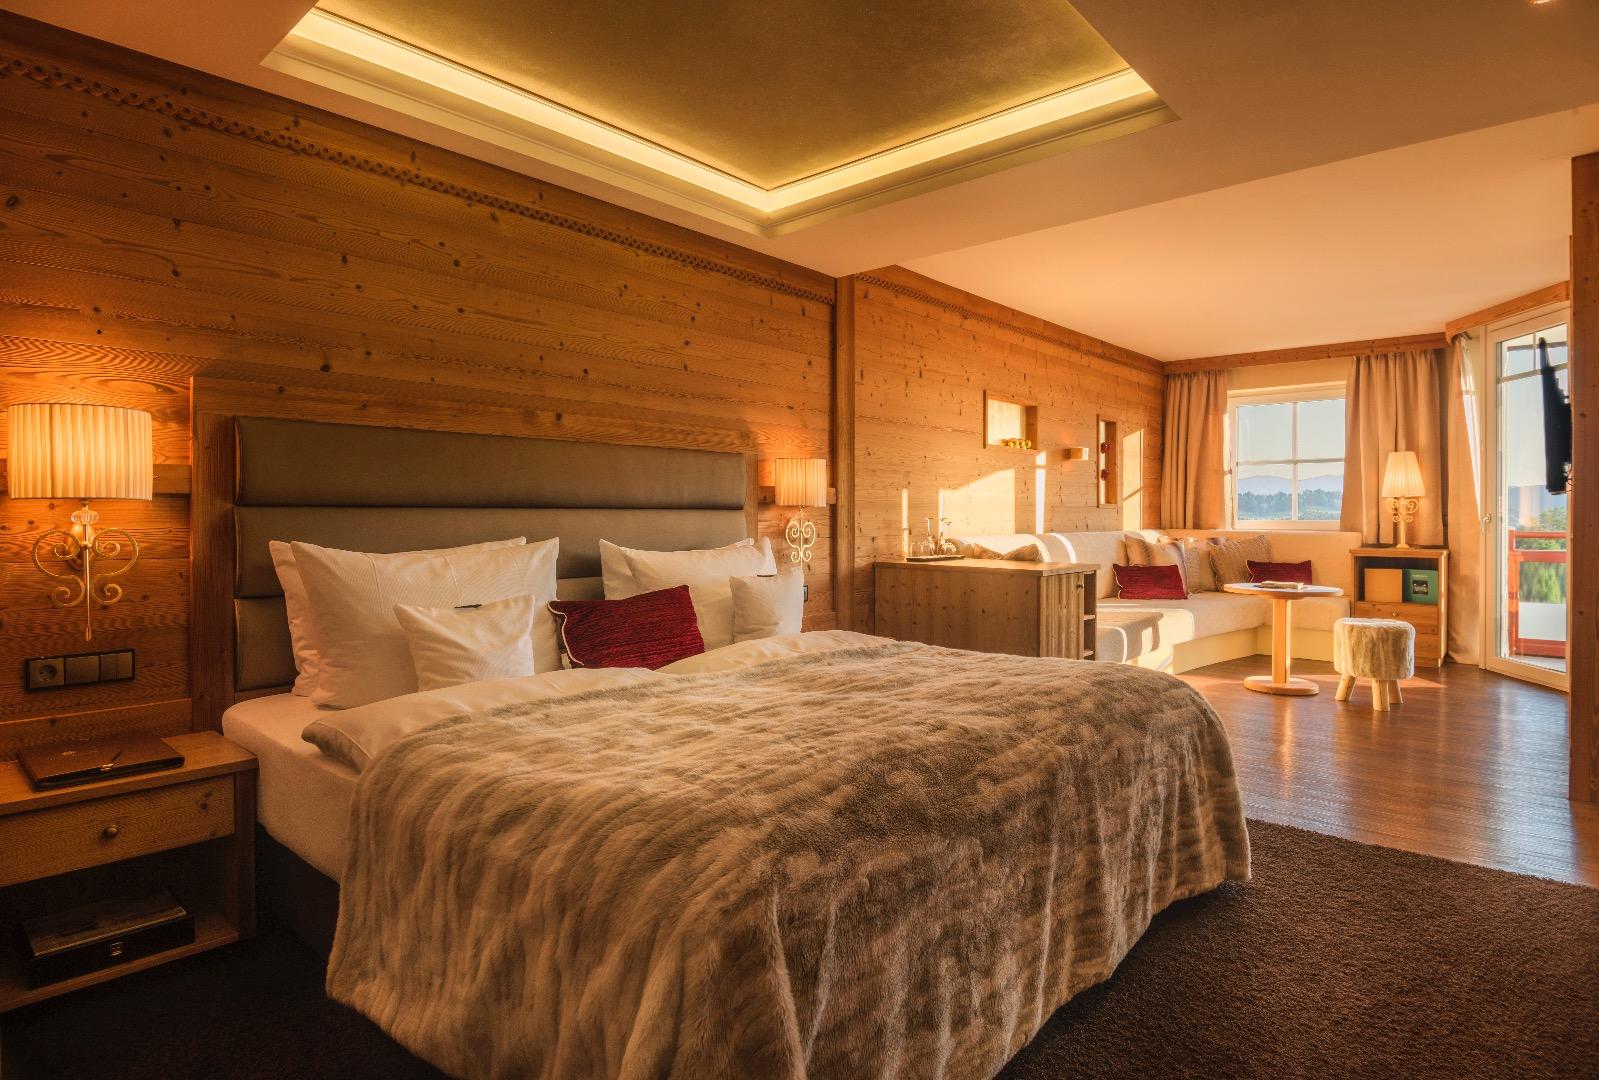 Modelage: Foto vom Wellnesshotel Relais & Châteaux Landromantik Hotel Oswald | Wellness Bayern